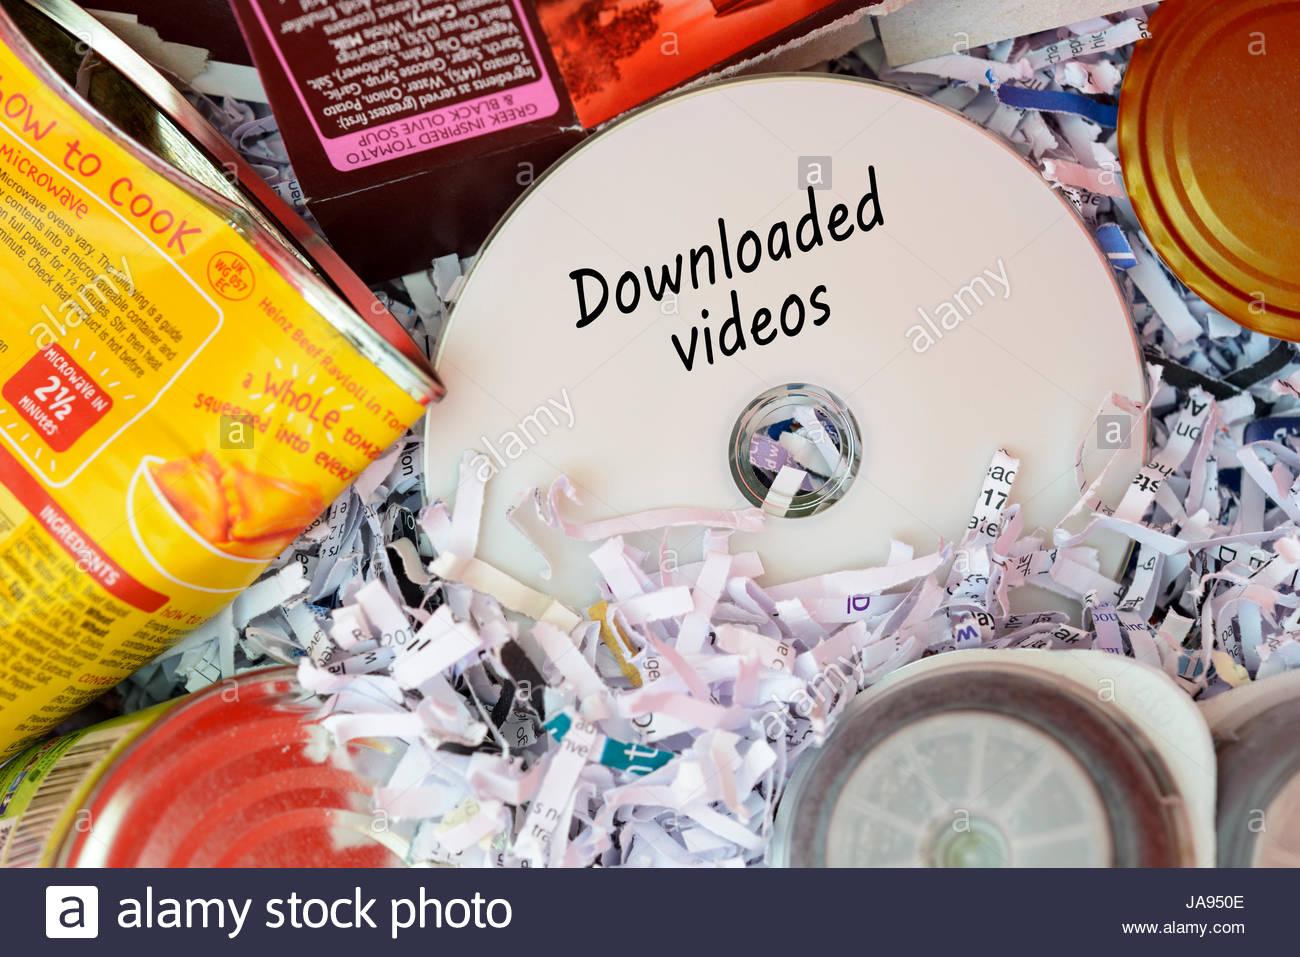 Downloaded videos, data disc thrown in Bin, Dorset, England. - Stock Image